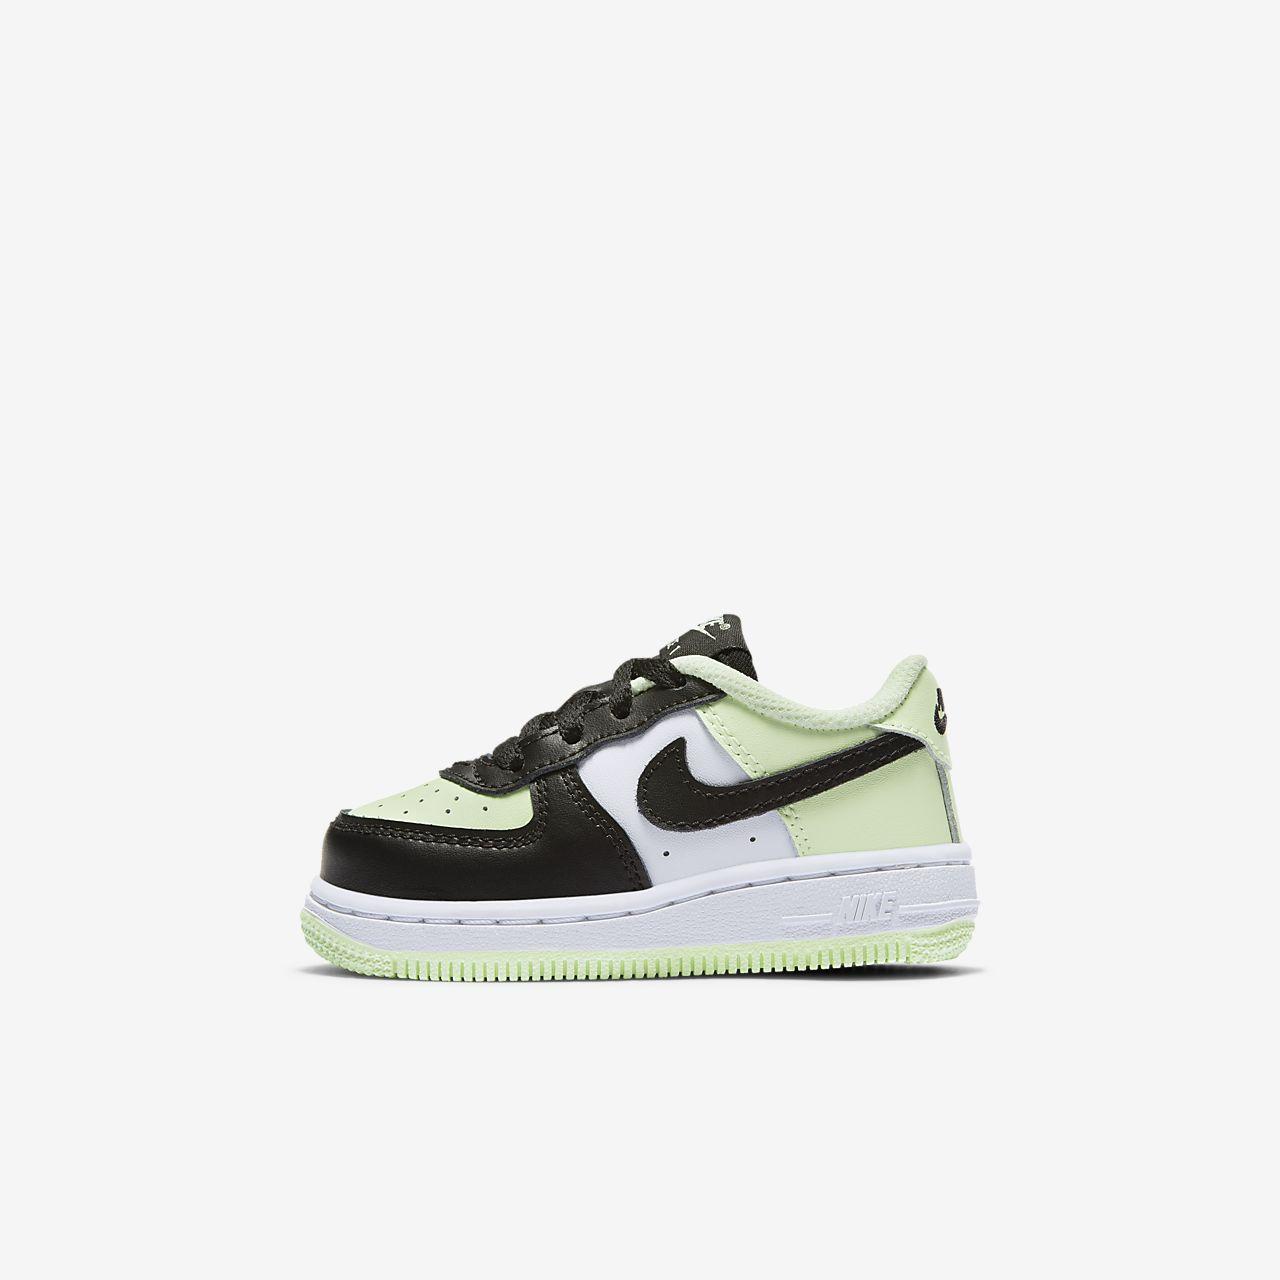 Nike Női Lifestyle Cipő Bolt, Nike Air Force 1 Ultra Flyknit